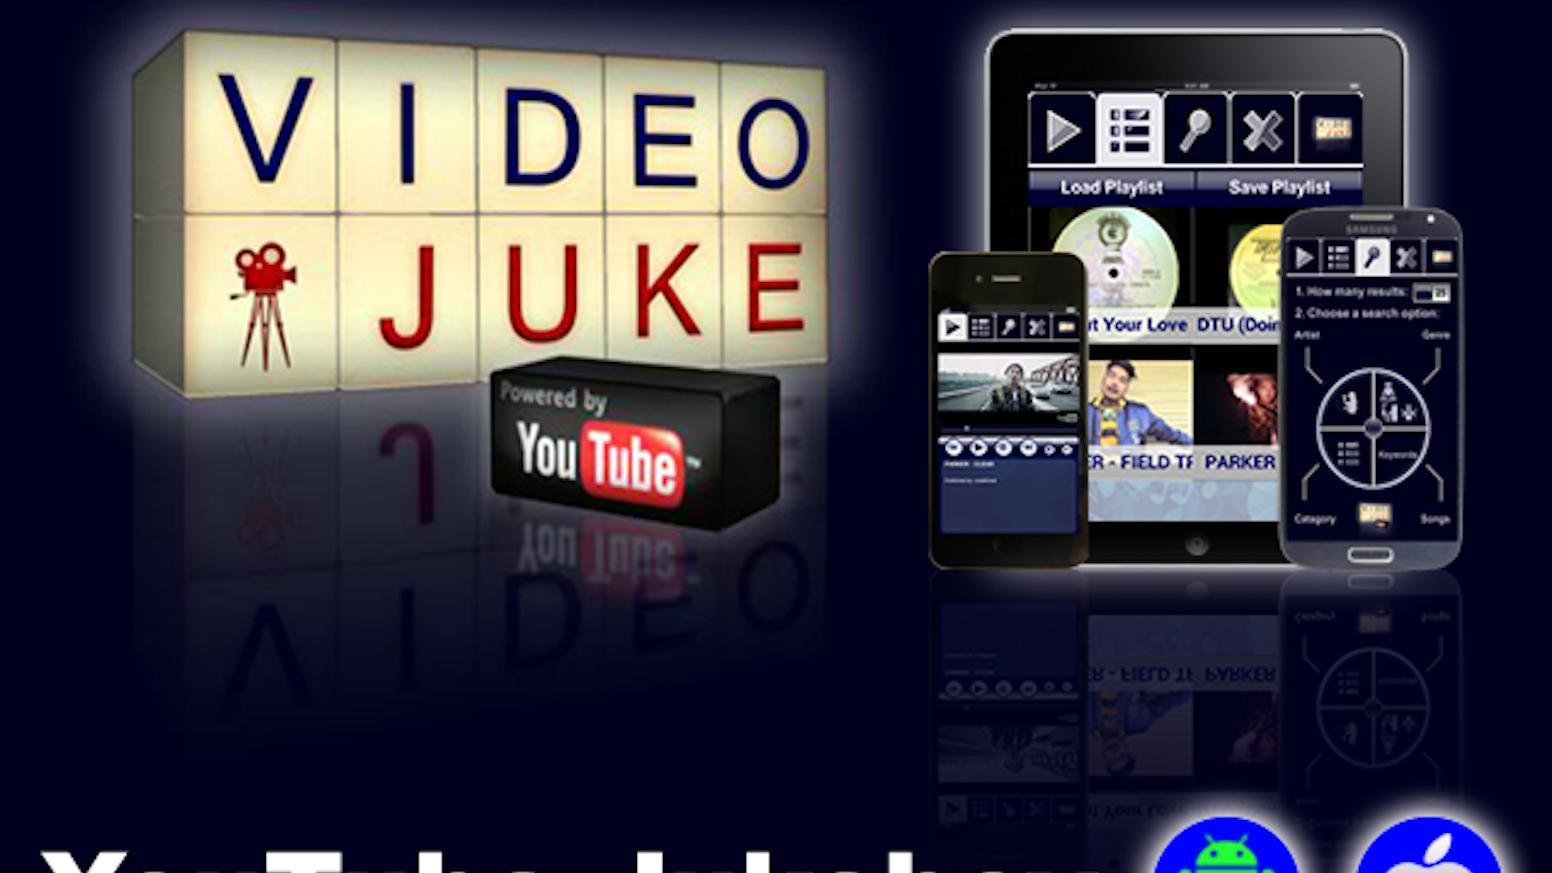 VideoJuke - A YouTube Video Jukebox Android/IOS by Elias Lee Gil Jr